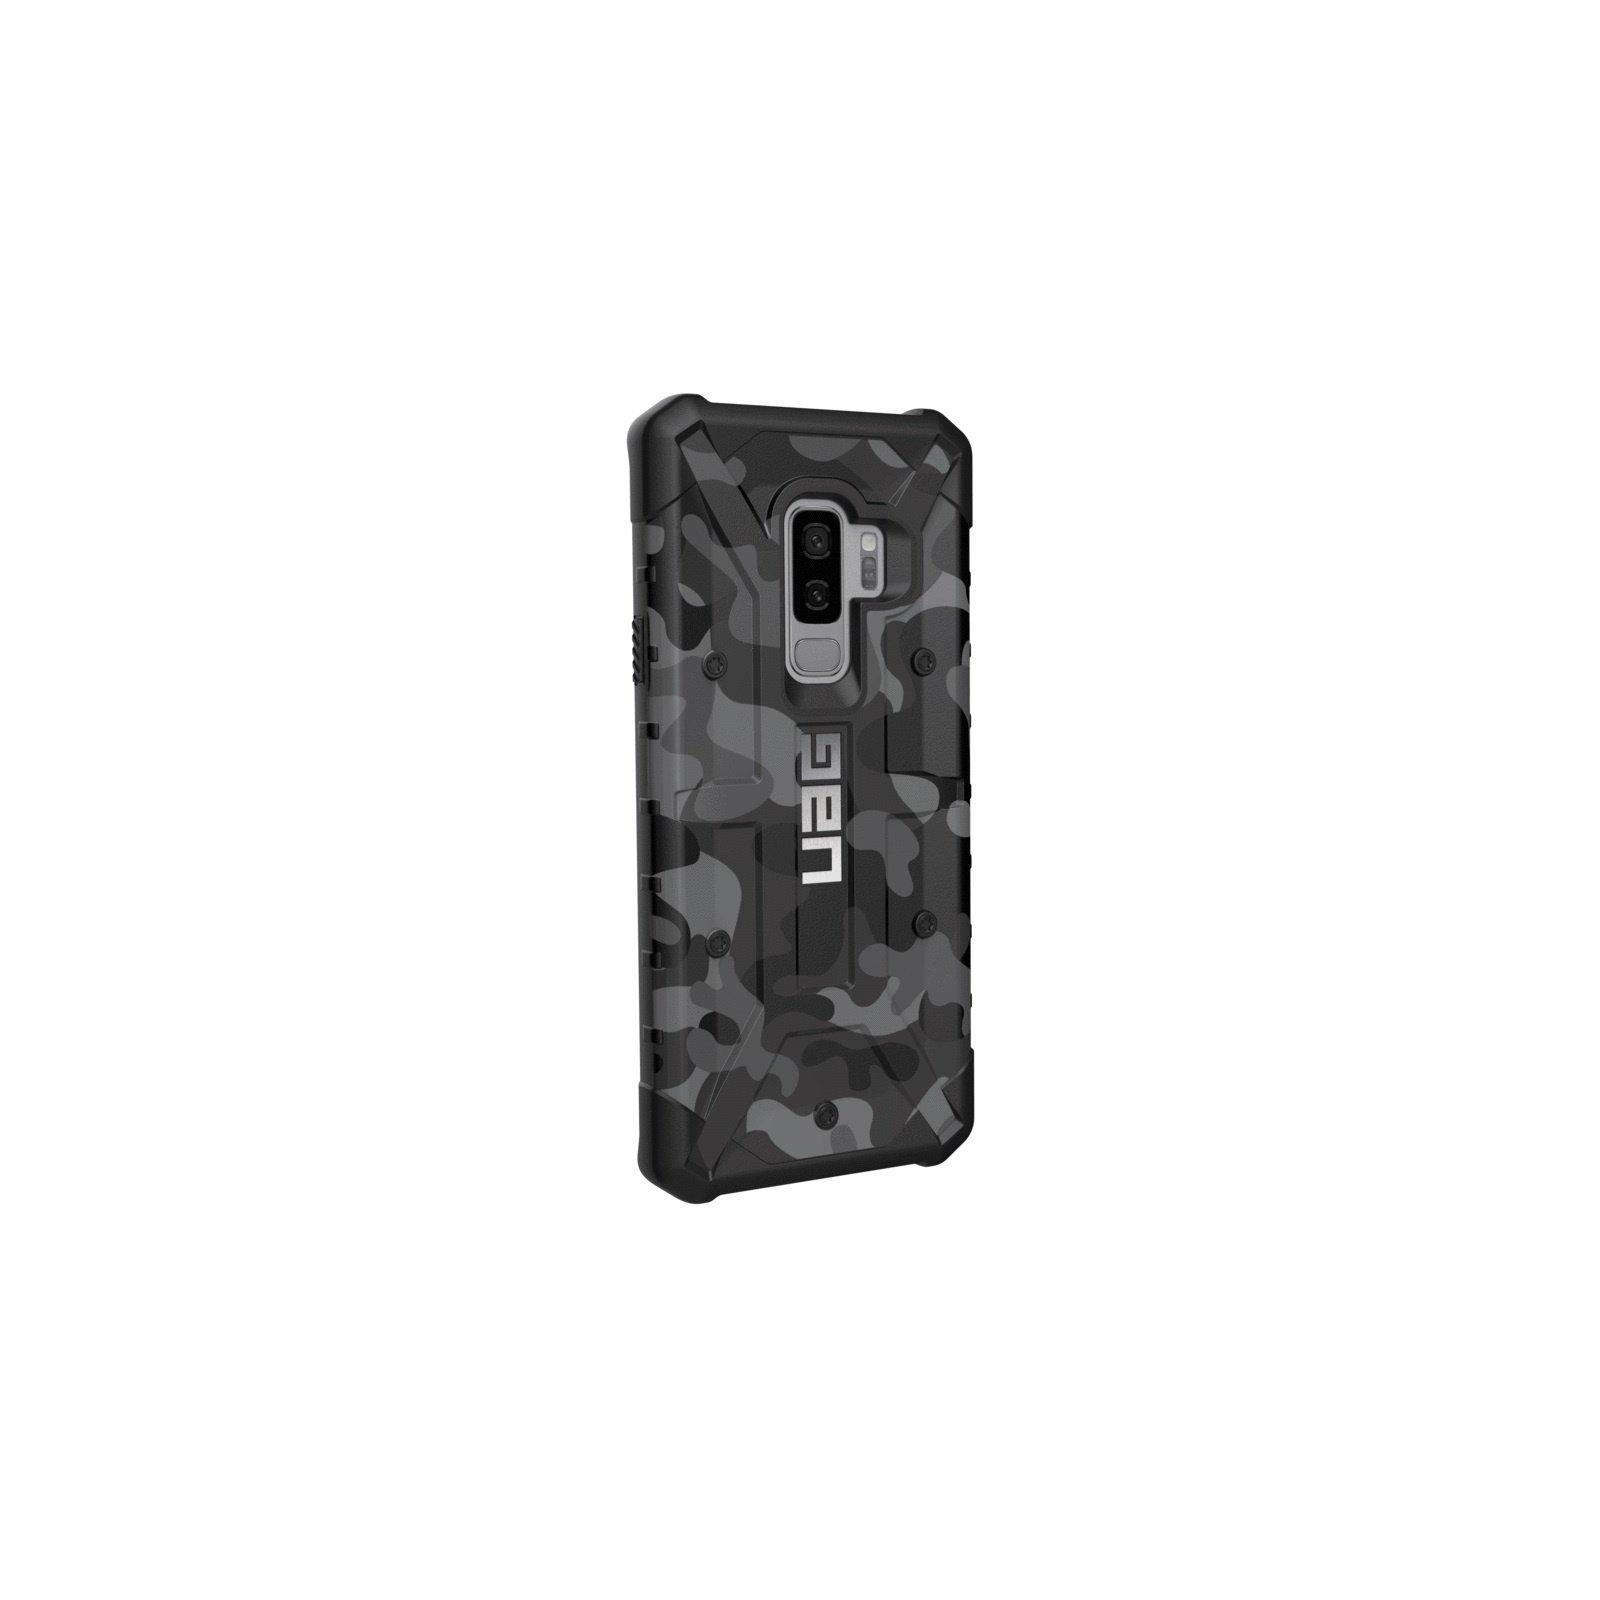 Чехол для моб. телефона Urban Armor Gear Galaxy S9+ Pathfinder Camo Gray/Black (GLXS9PLS-A-BC) изображение 2